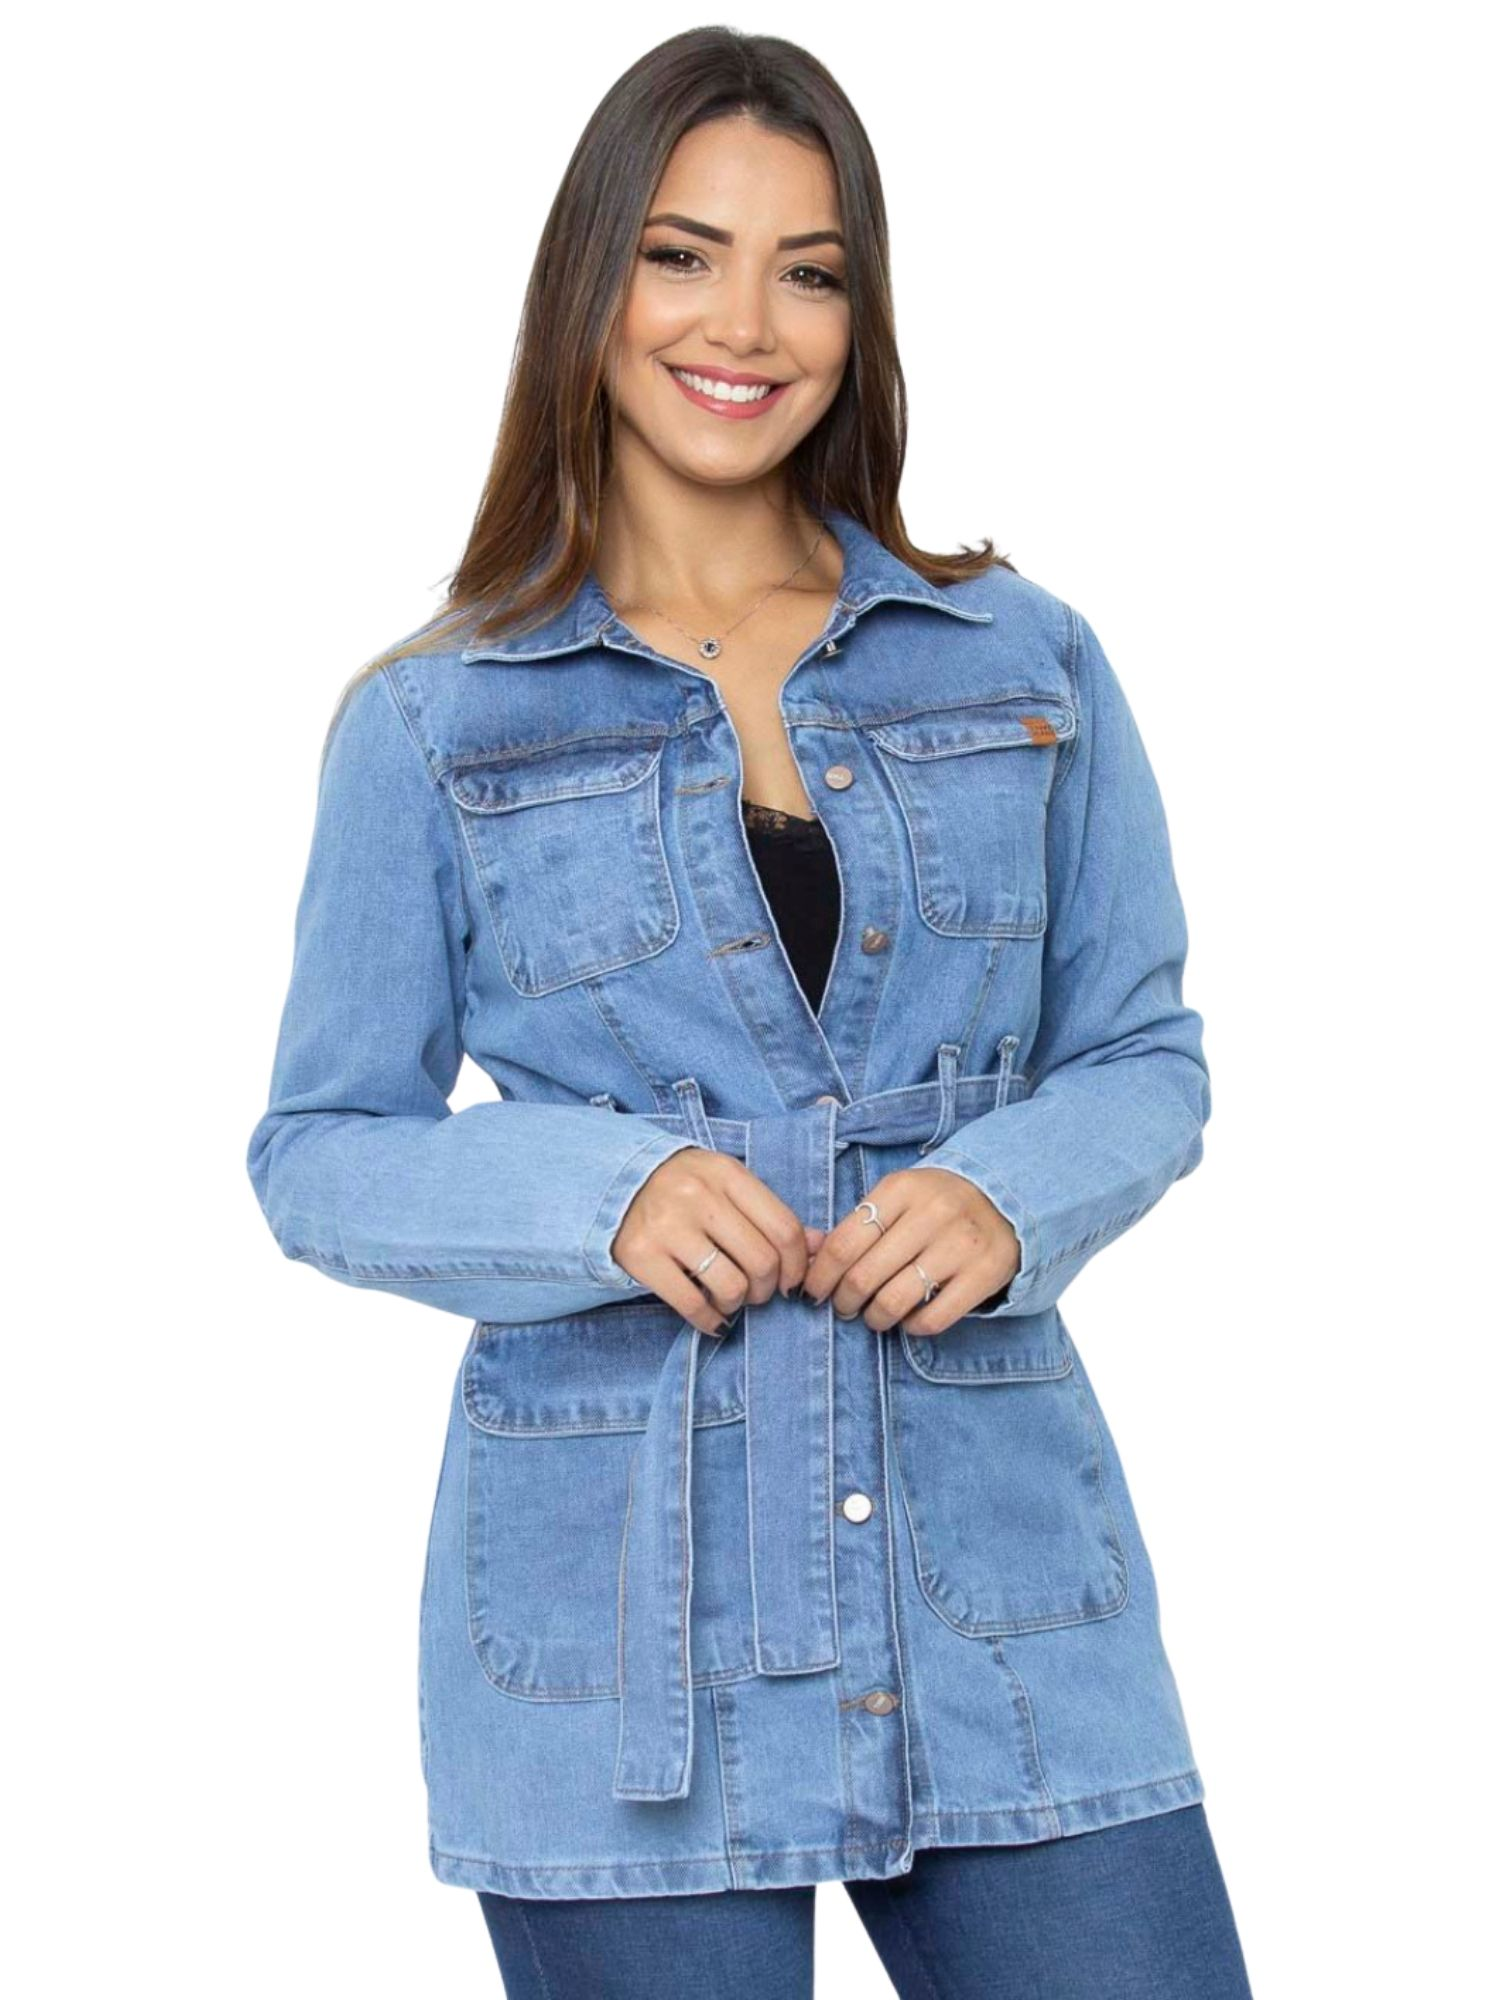 Jaqueta Feminina Jeans Tnw Jeans 51636